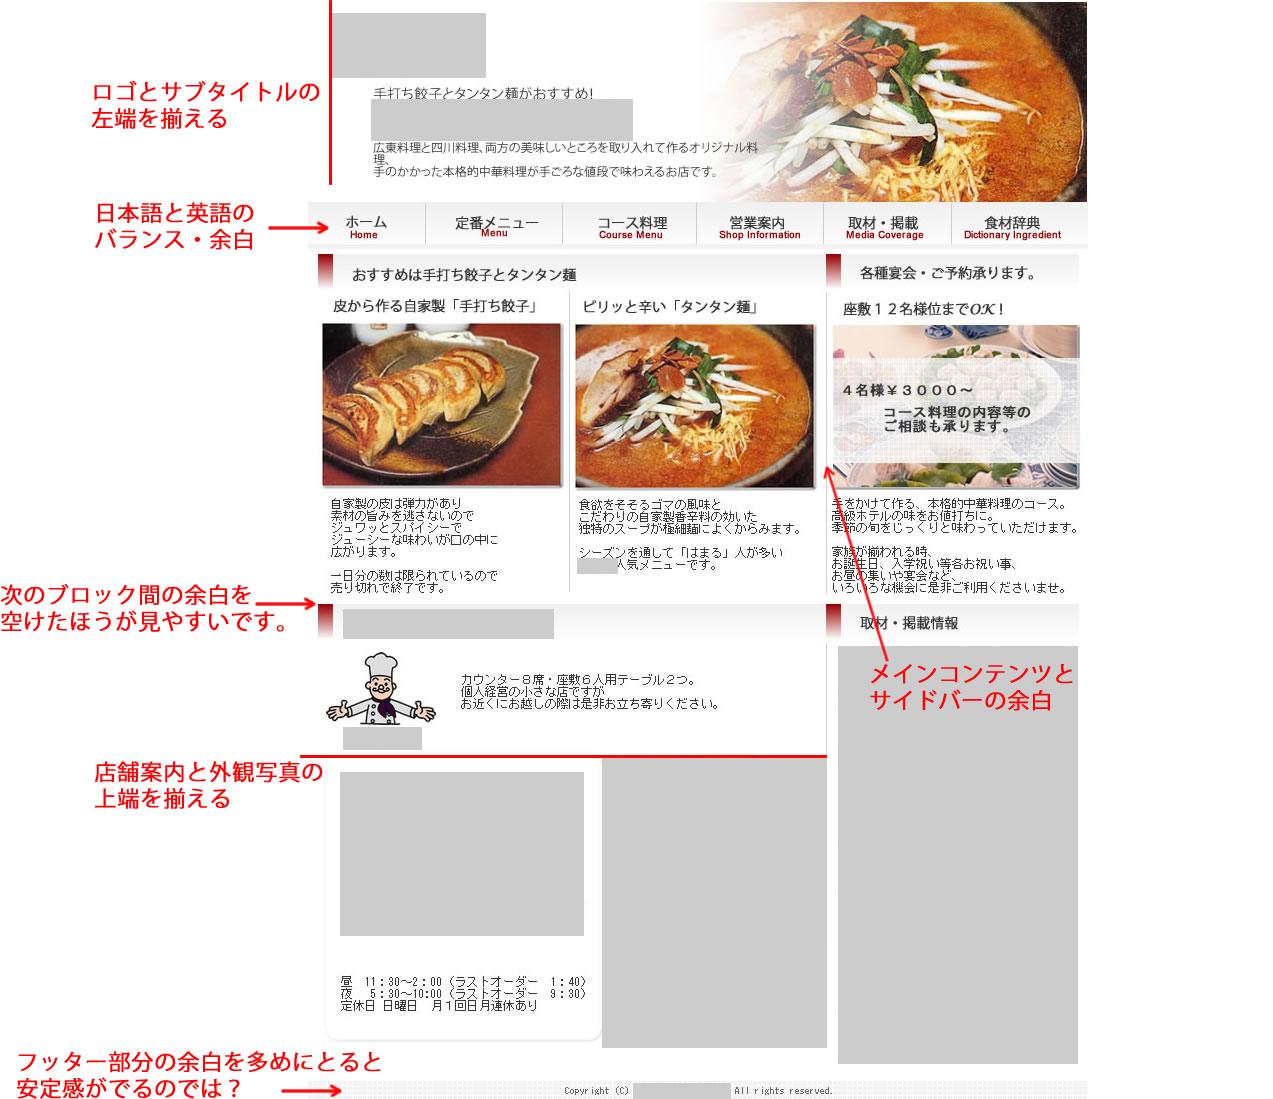 【Webデザインオンライン講座】個人指導事例 飲食店サイトのWebデザイン